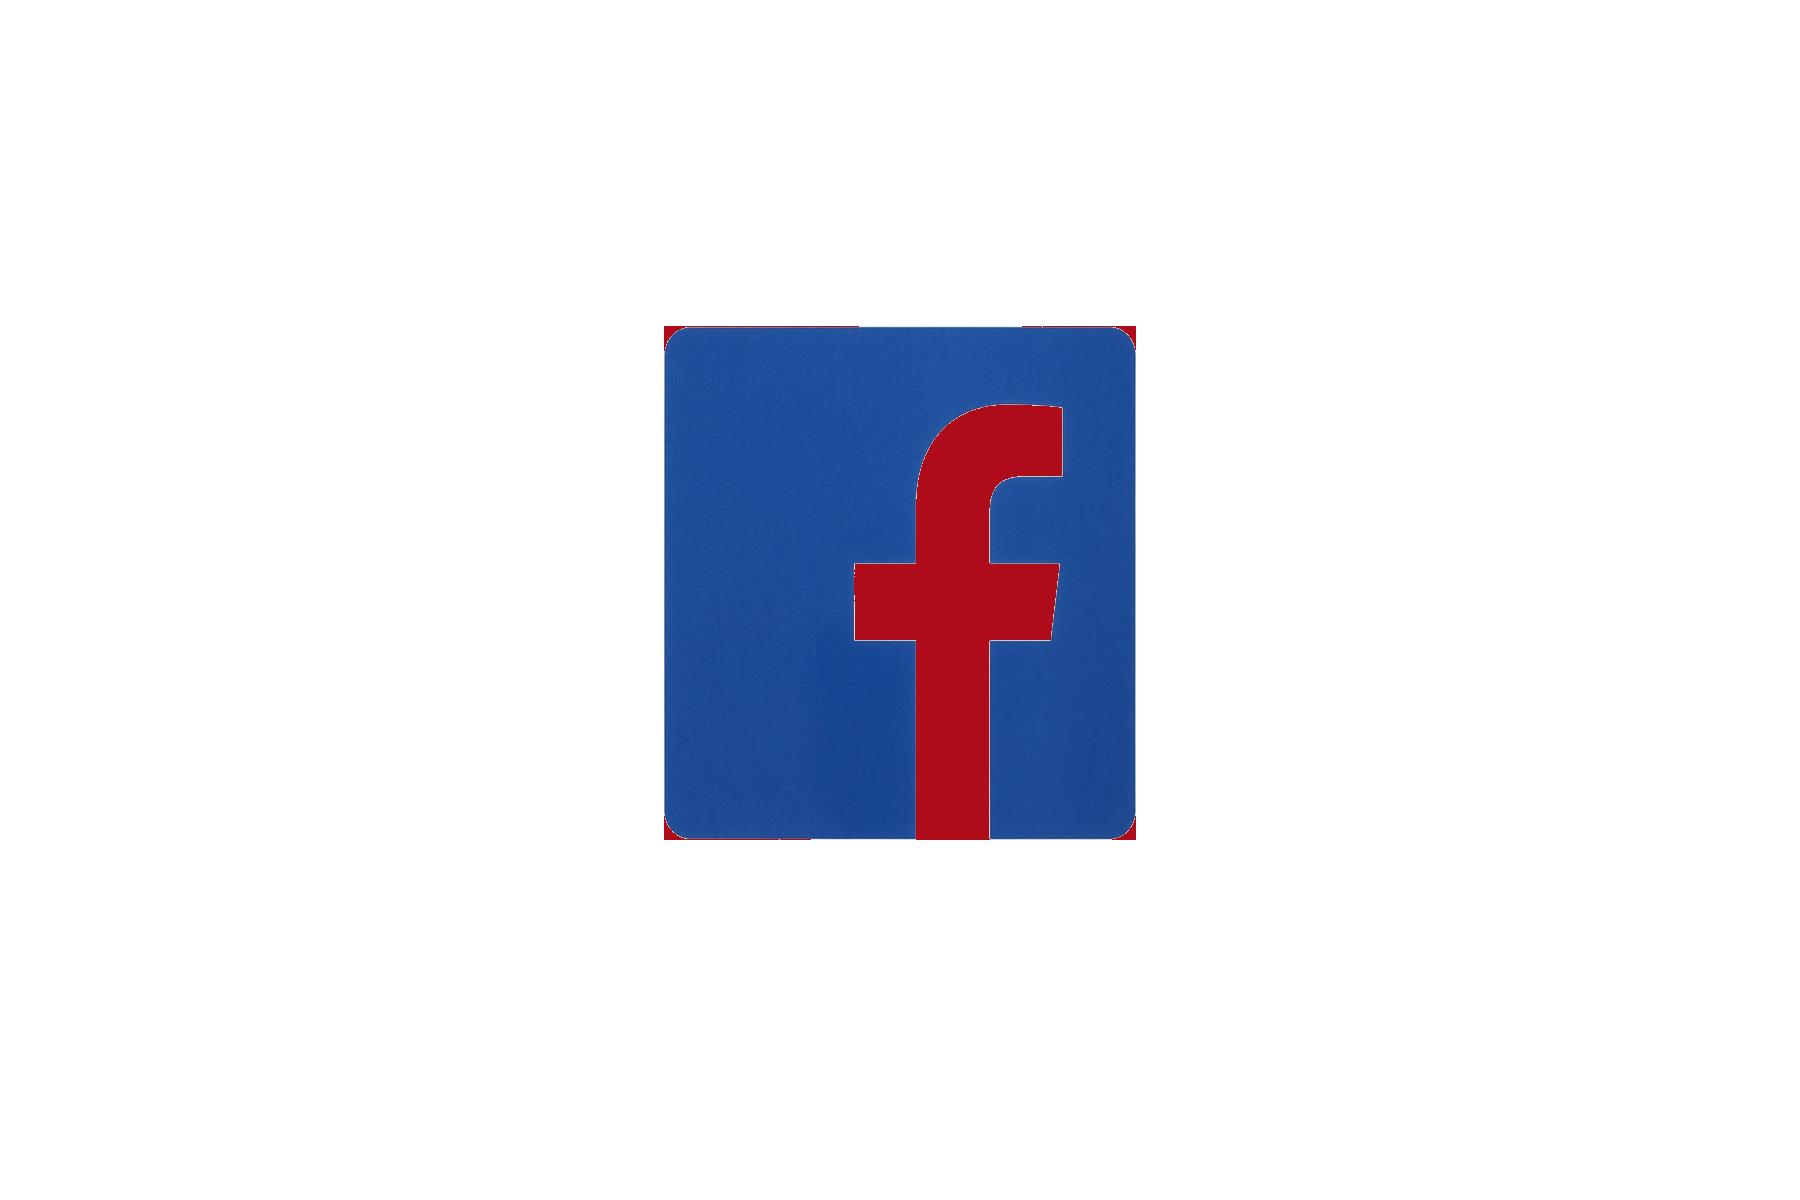 social media logo1.png